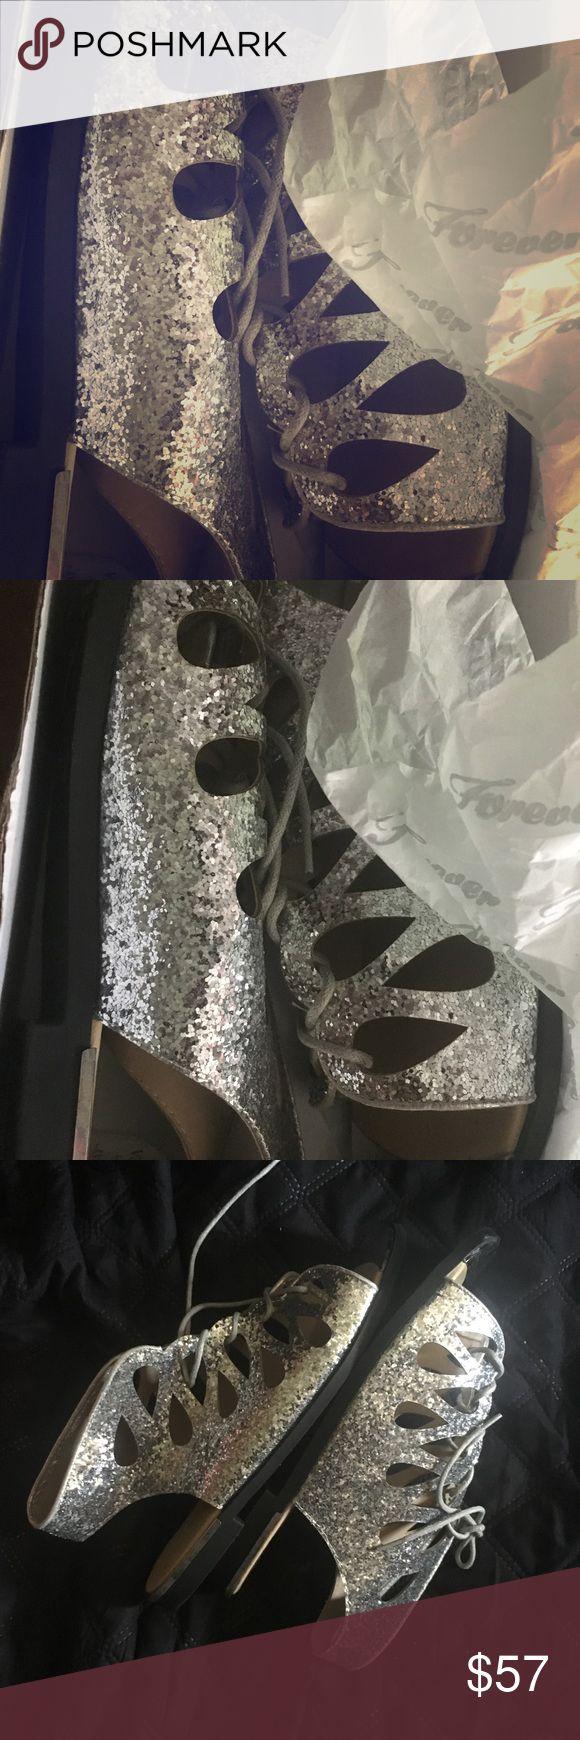 Sandals 💫 Black & Silver 🕋 kill them with fashion 💫#Pure #Fashionkilla #Fresh A/X Armani Exchange Shoes Sandals